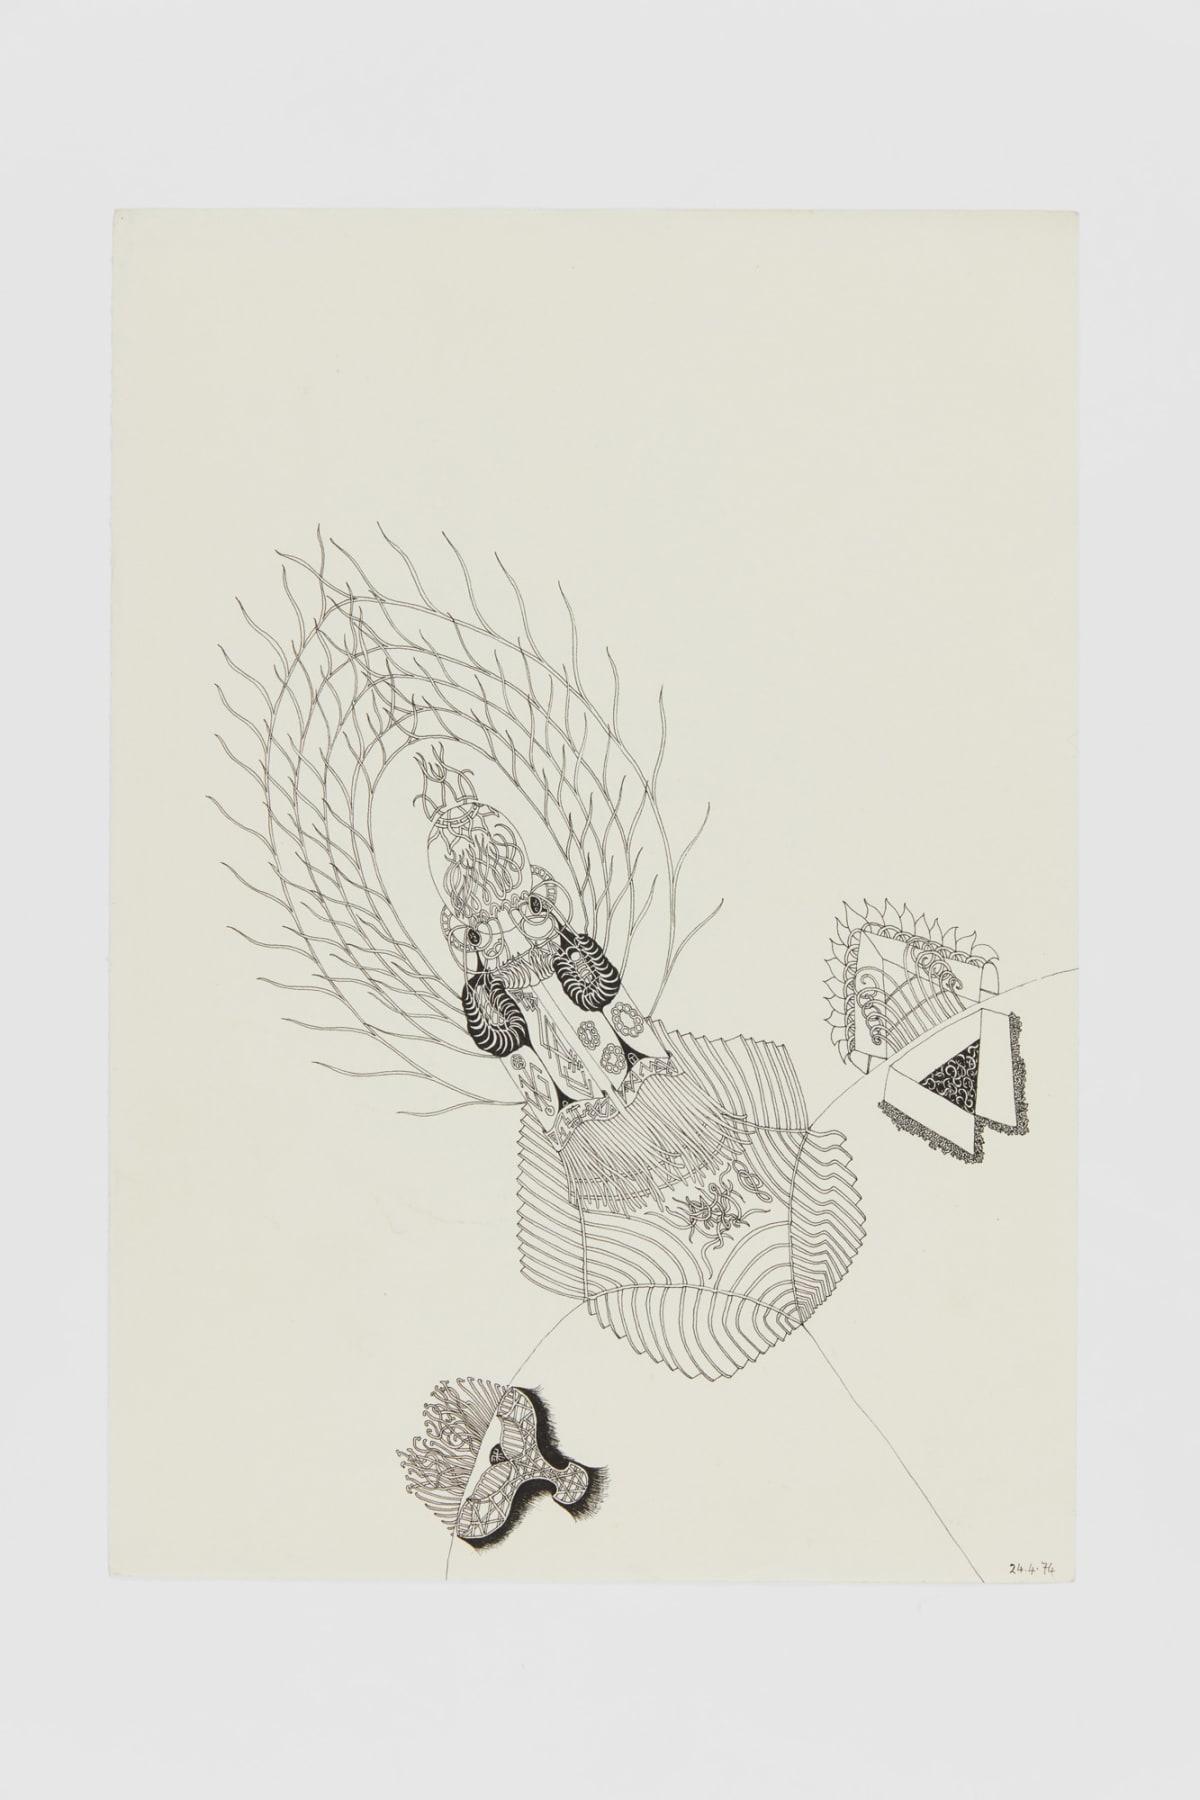 Ann CHURCHILL 24.4.74 (Daily drawings), 1974 Pen on paper 29.7 x 20.9 cm